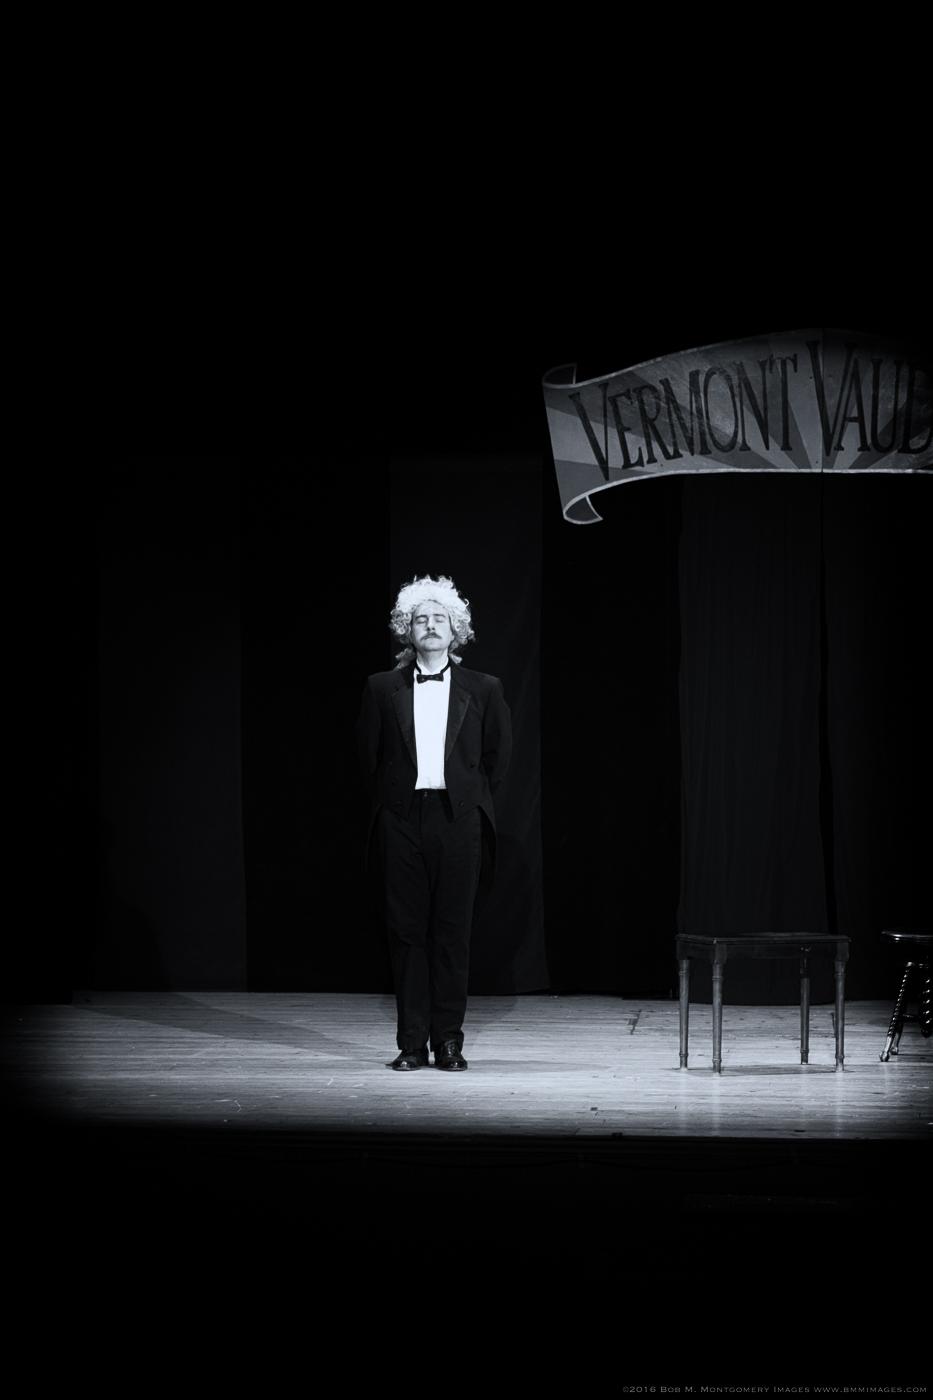 Vermont Vaudeville 20160513 - 0063.jpg